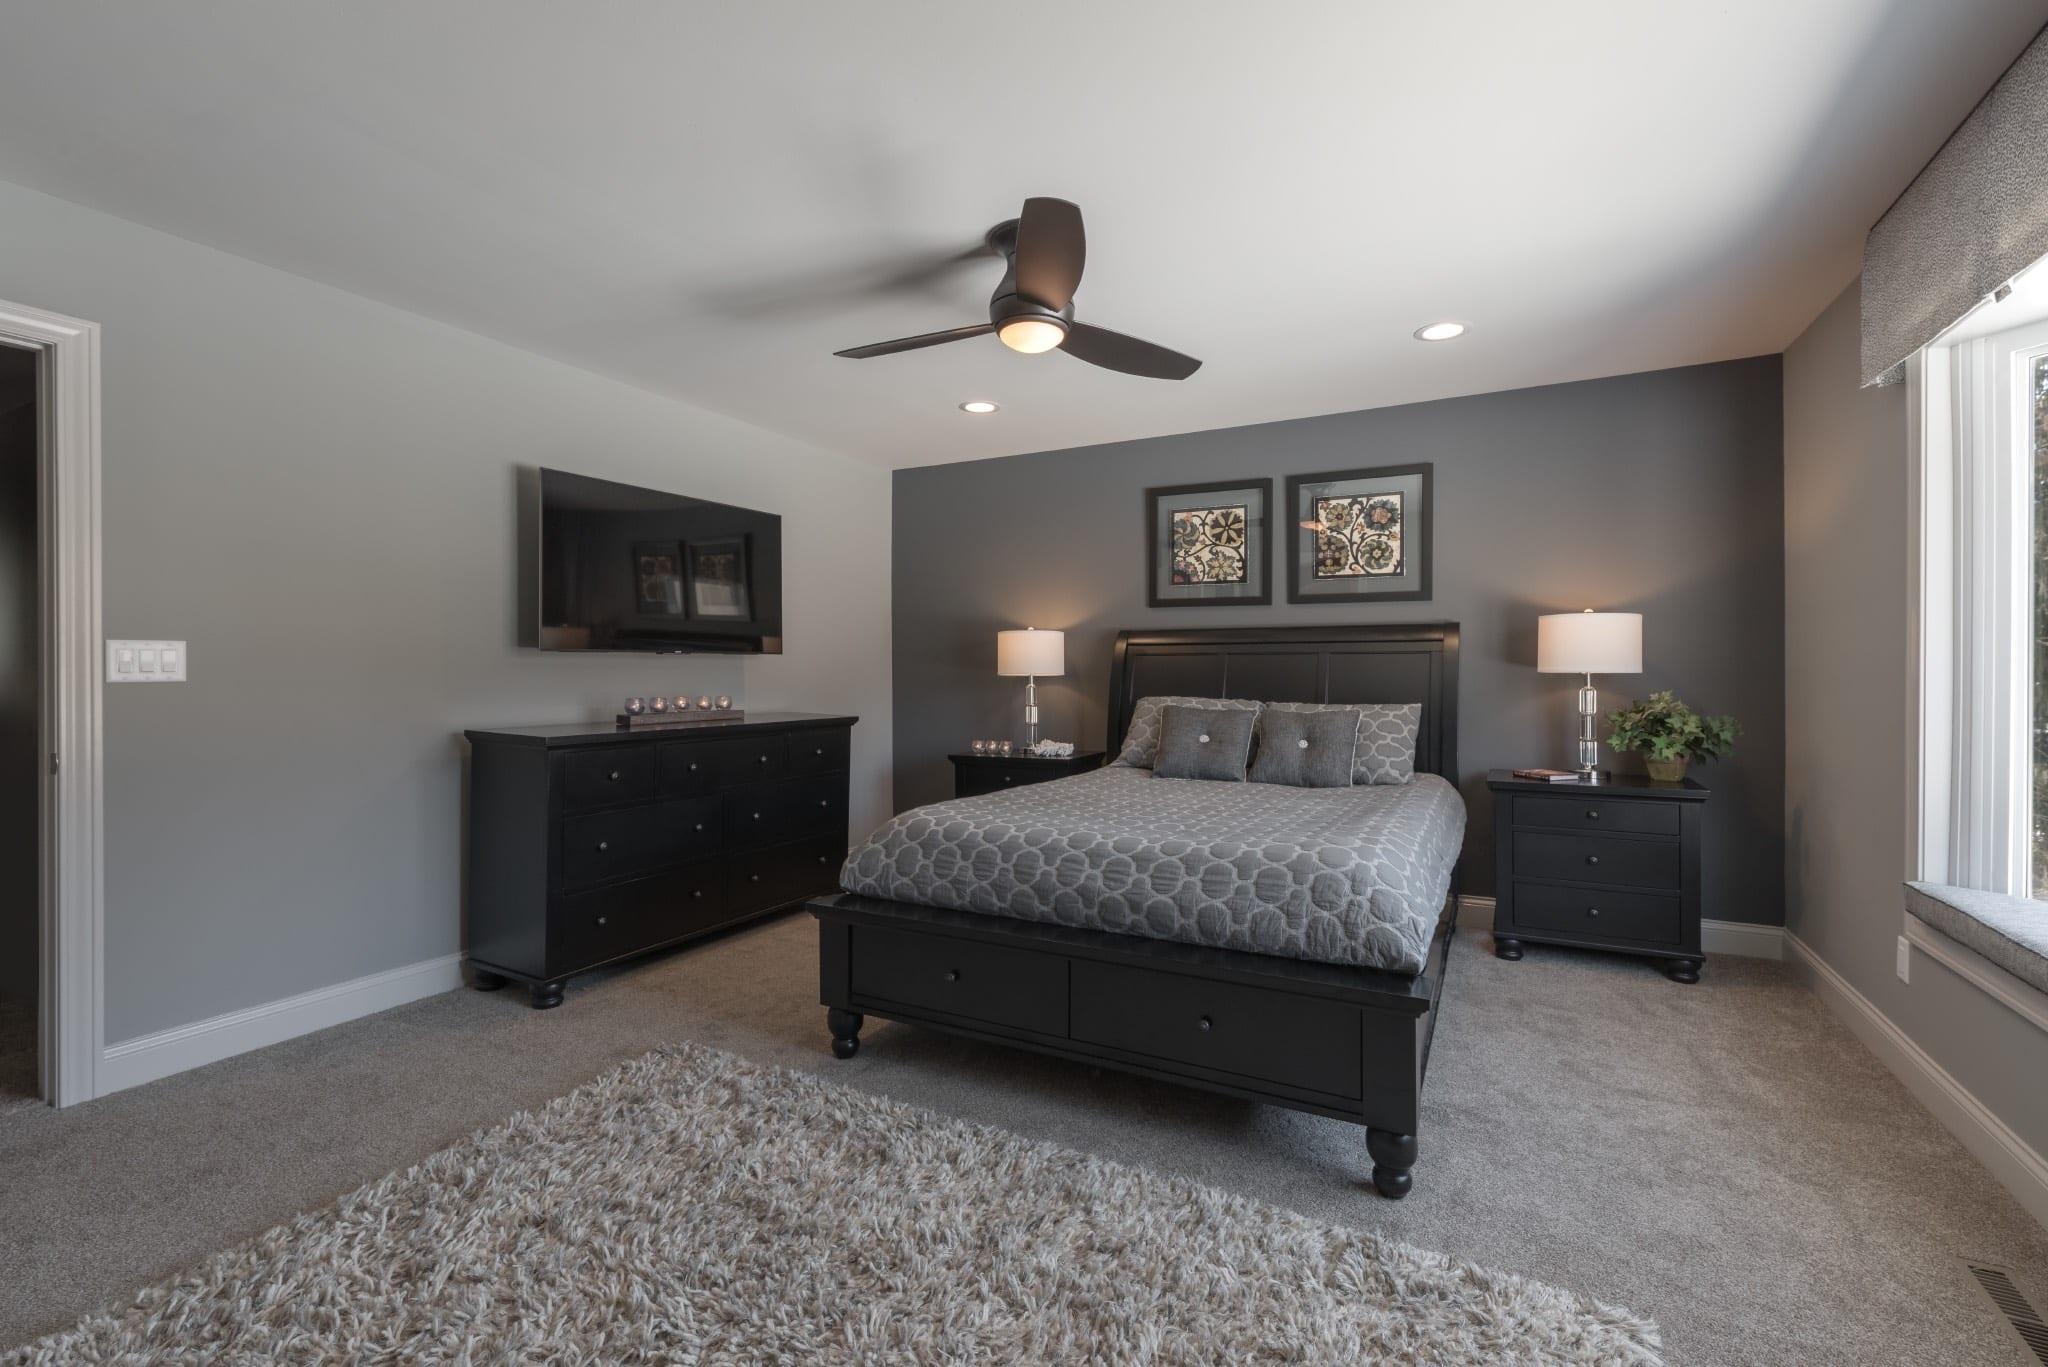 Bedroom Furnishings 60012